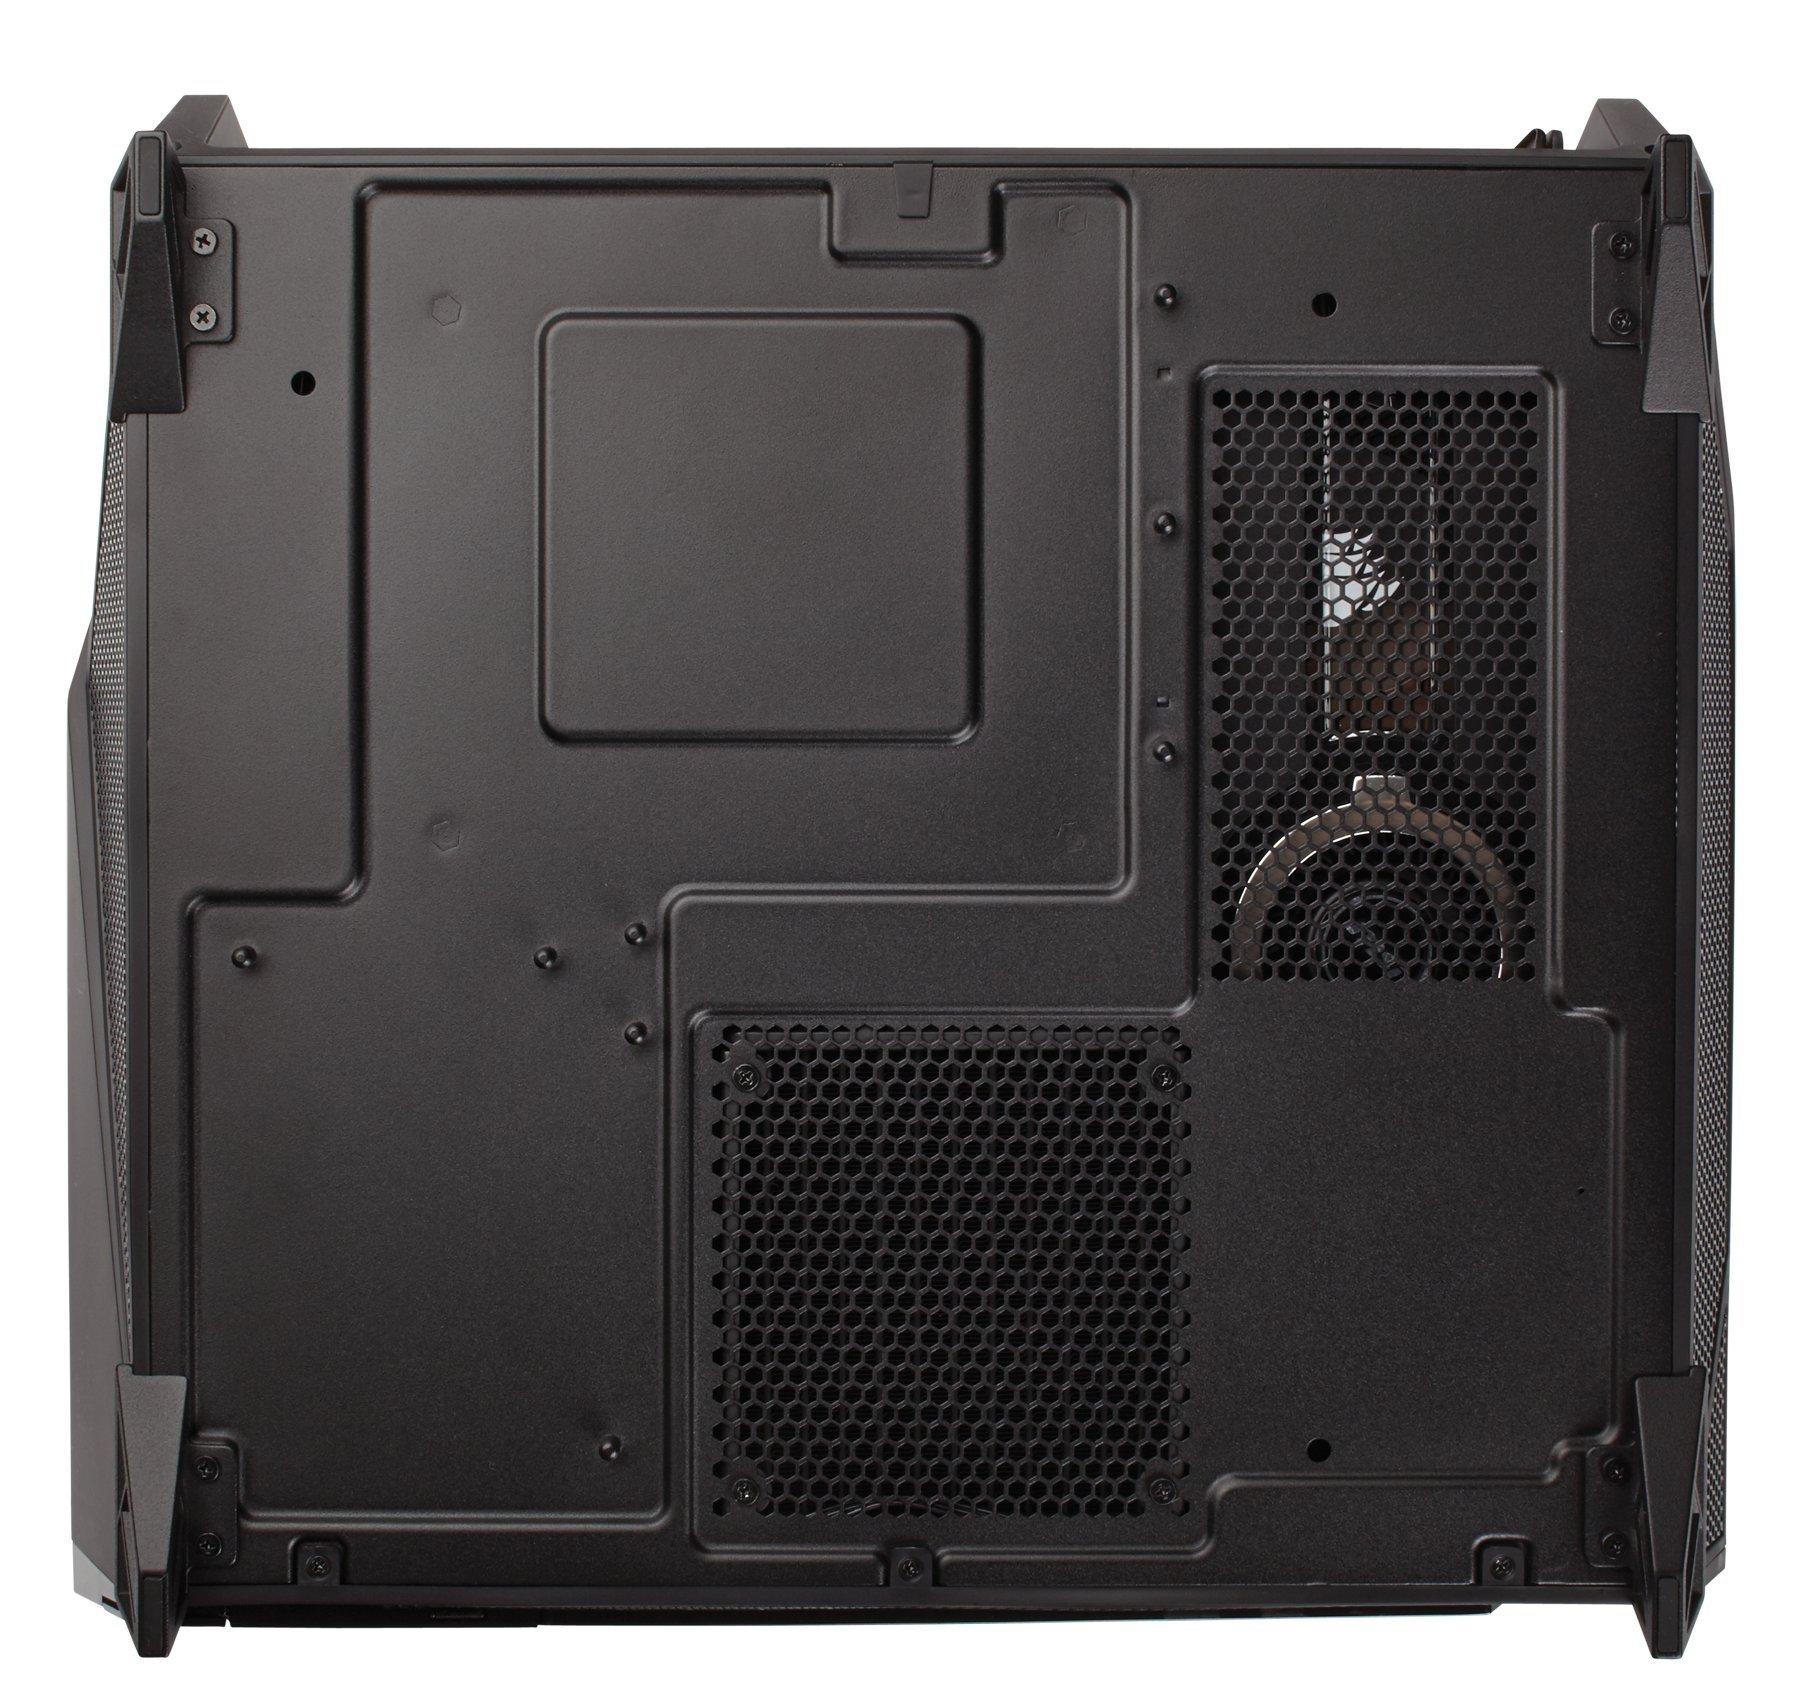 Corsair Bulldog High Performance PC Kit Computer Barebones Systems CS-9000001-NA by Corsair (Image #5)